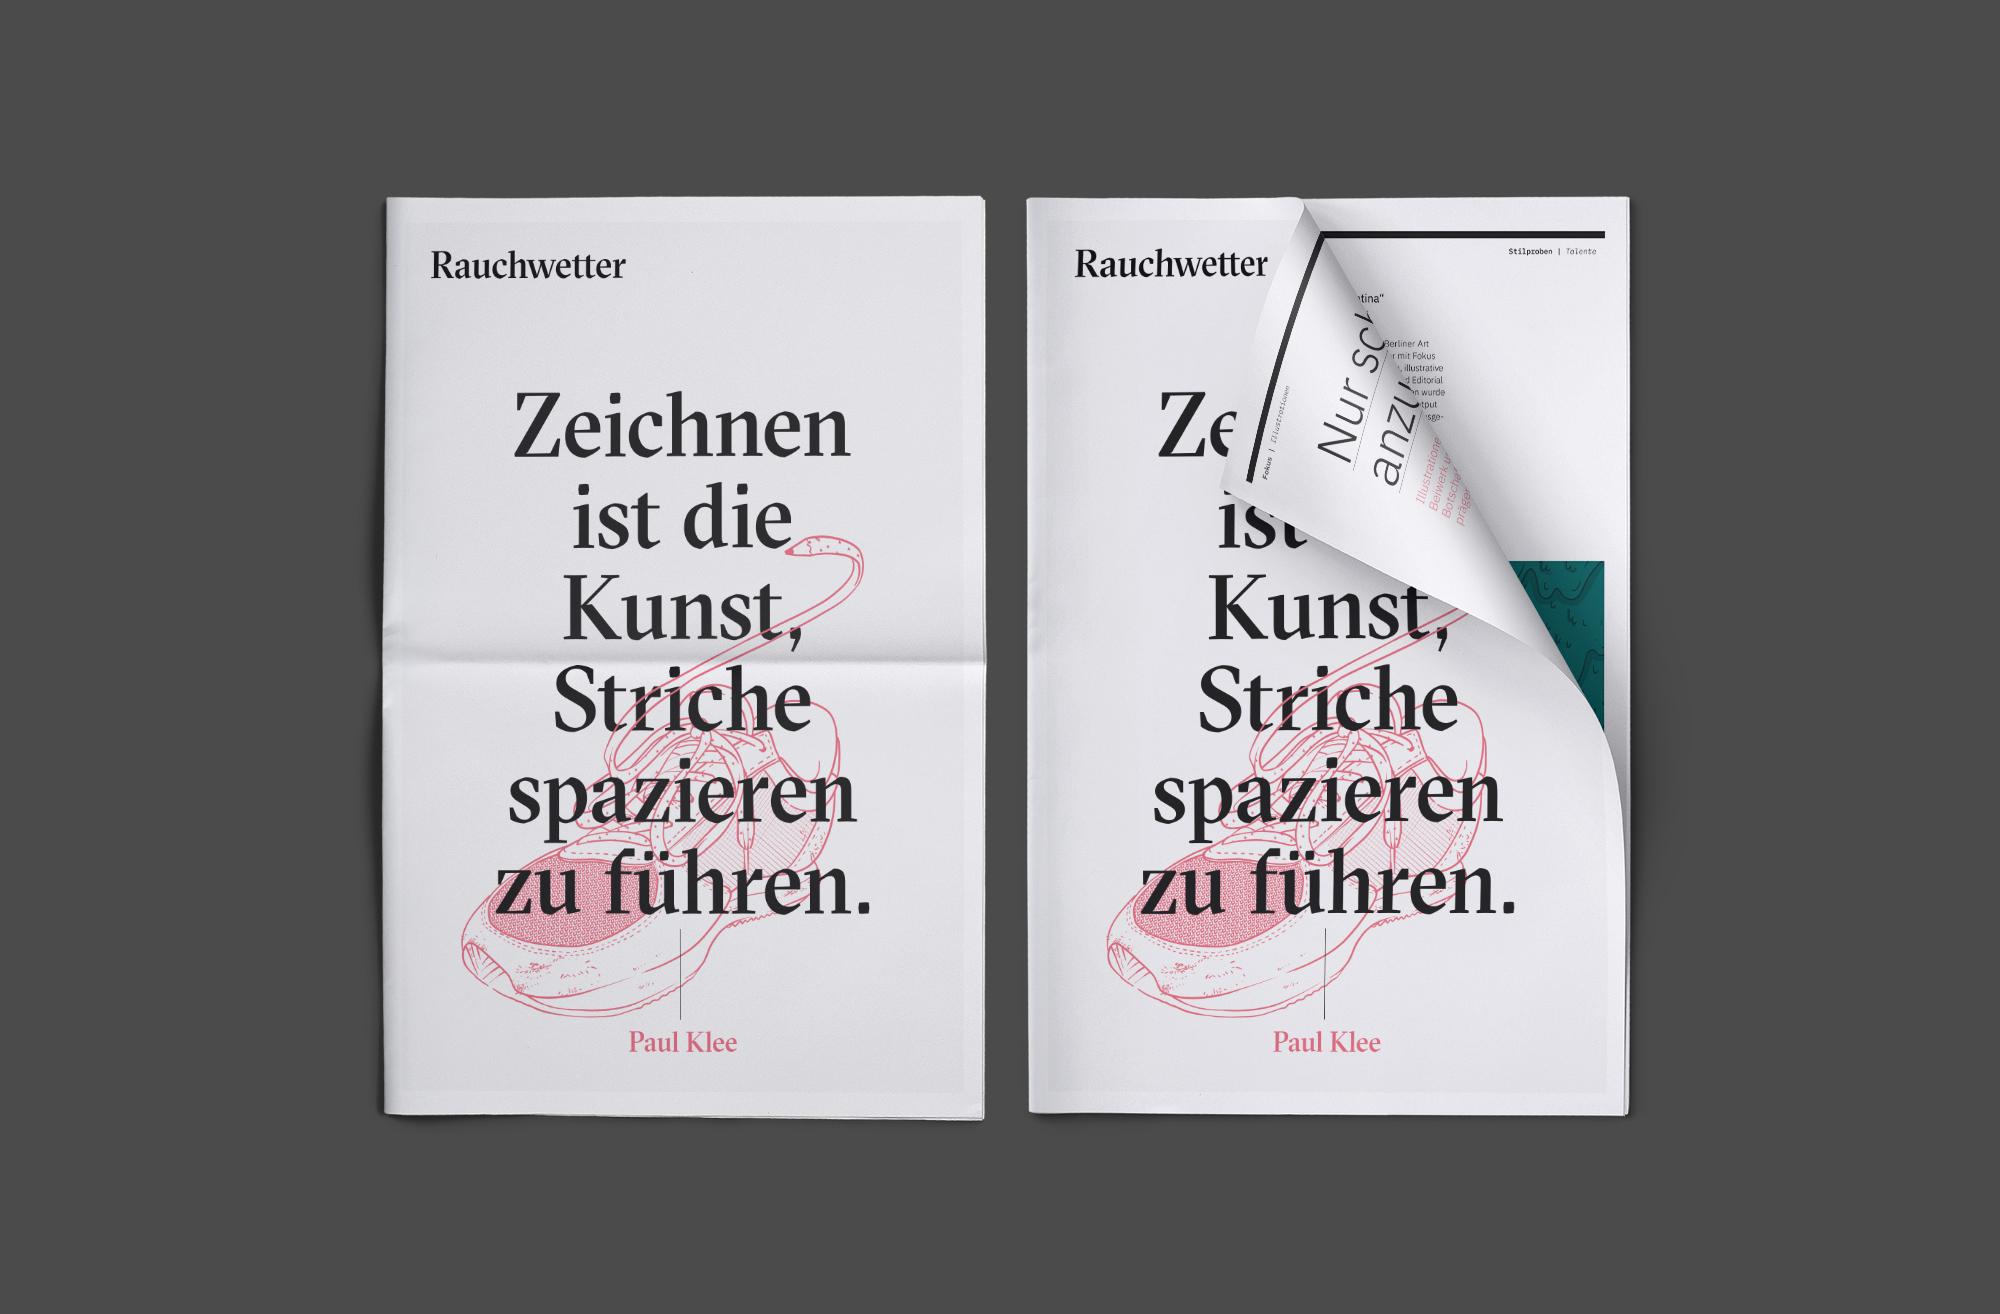 Zeitung 01 (Rauchwetter, Corporate Design)